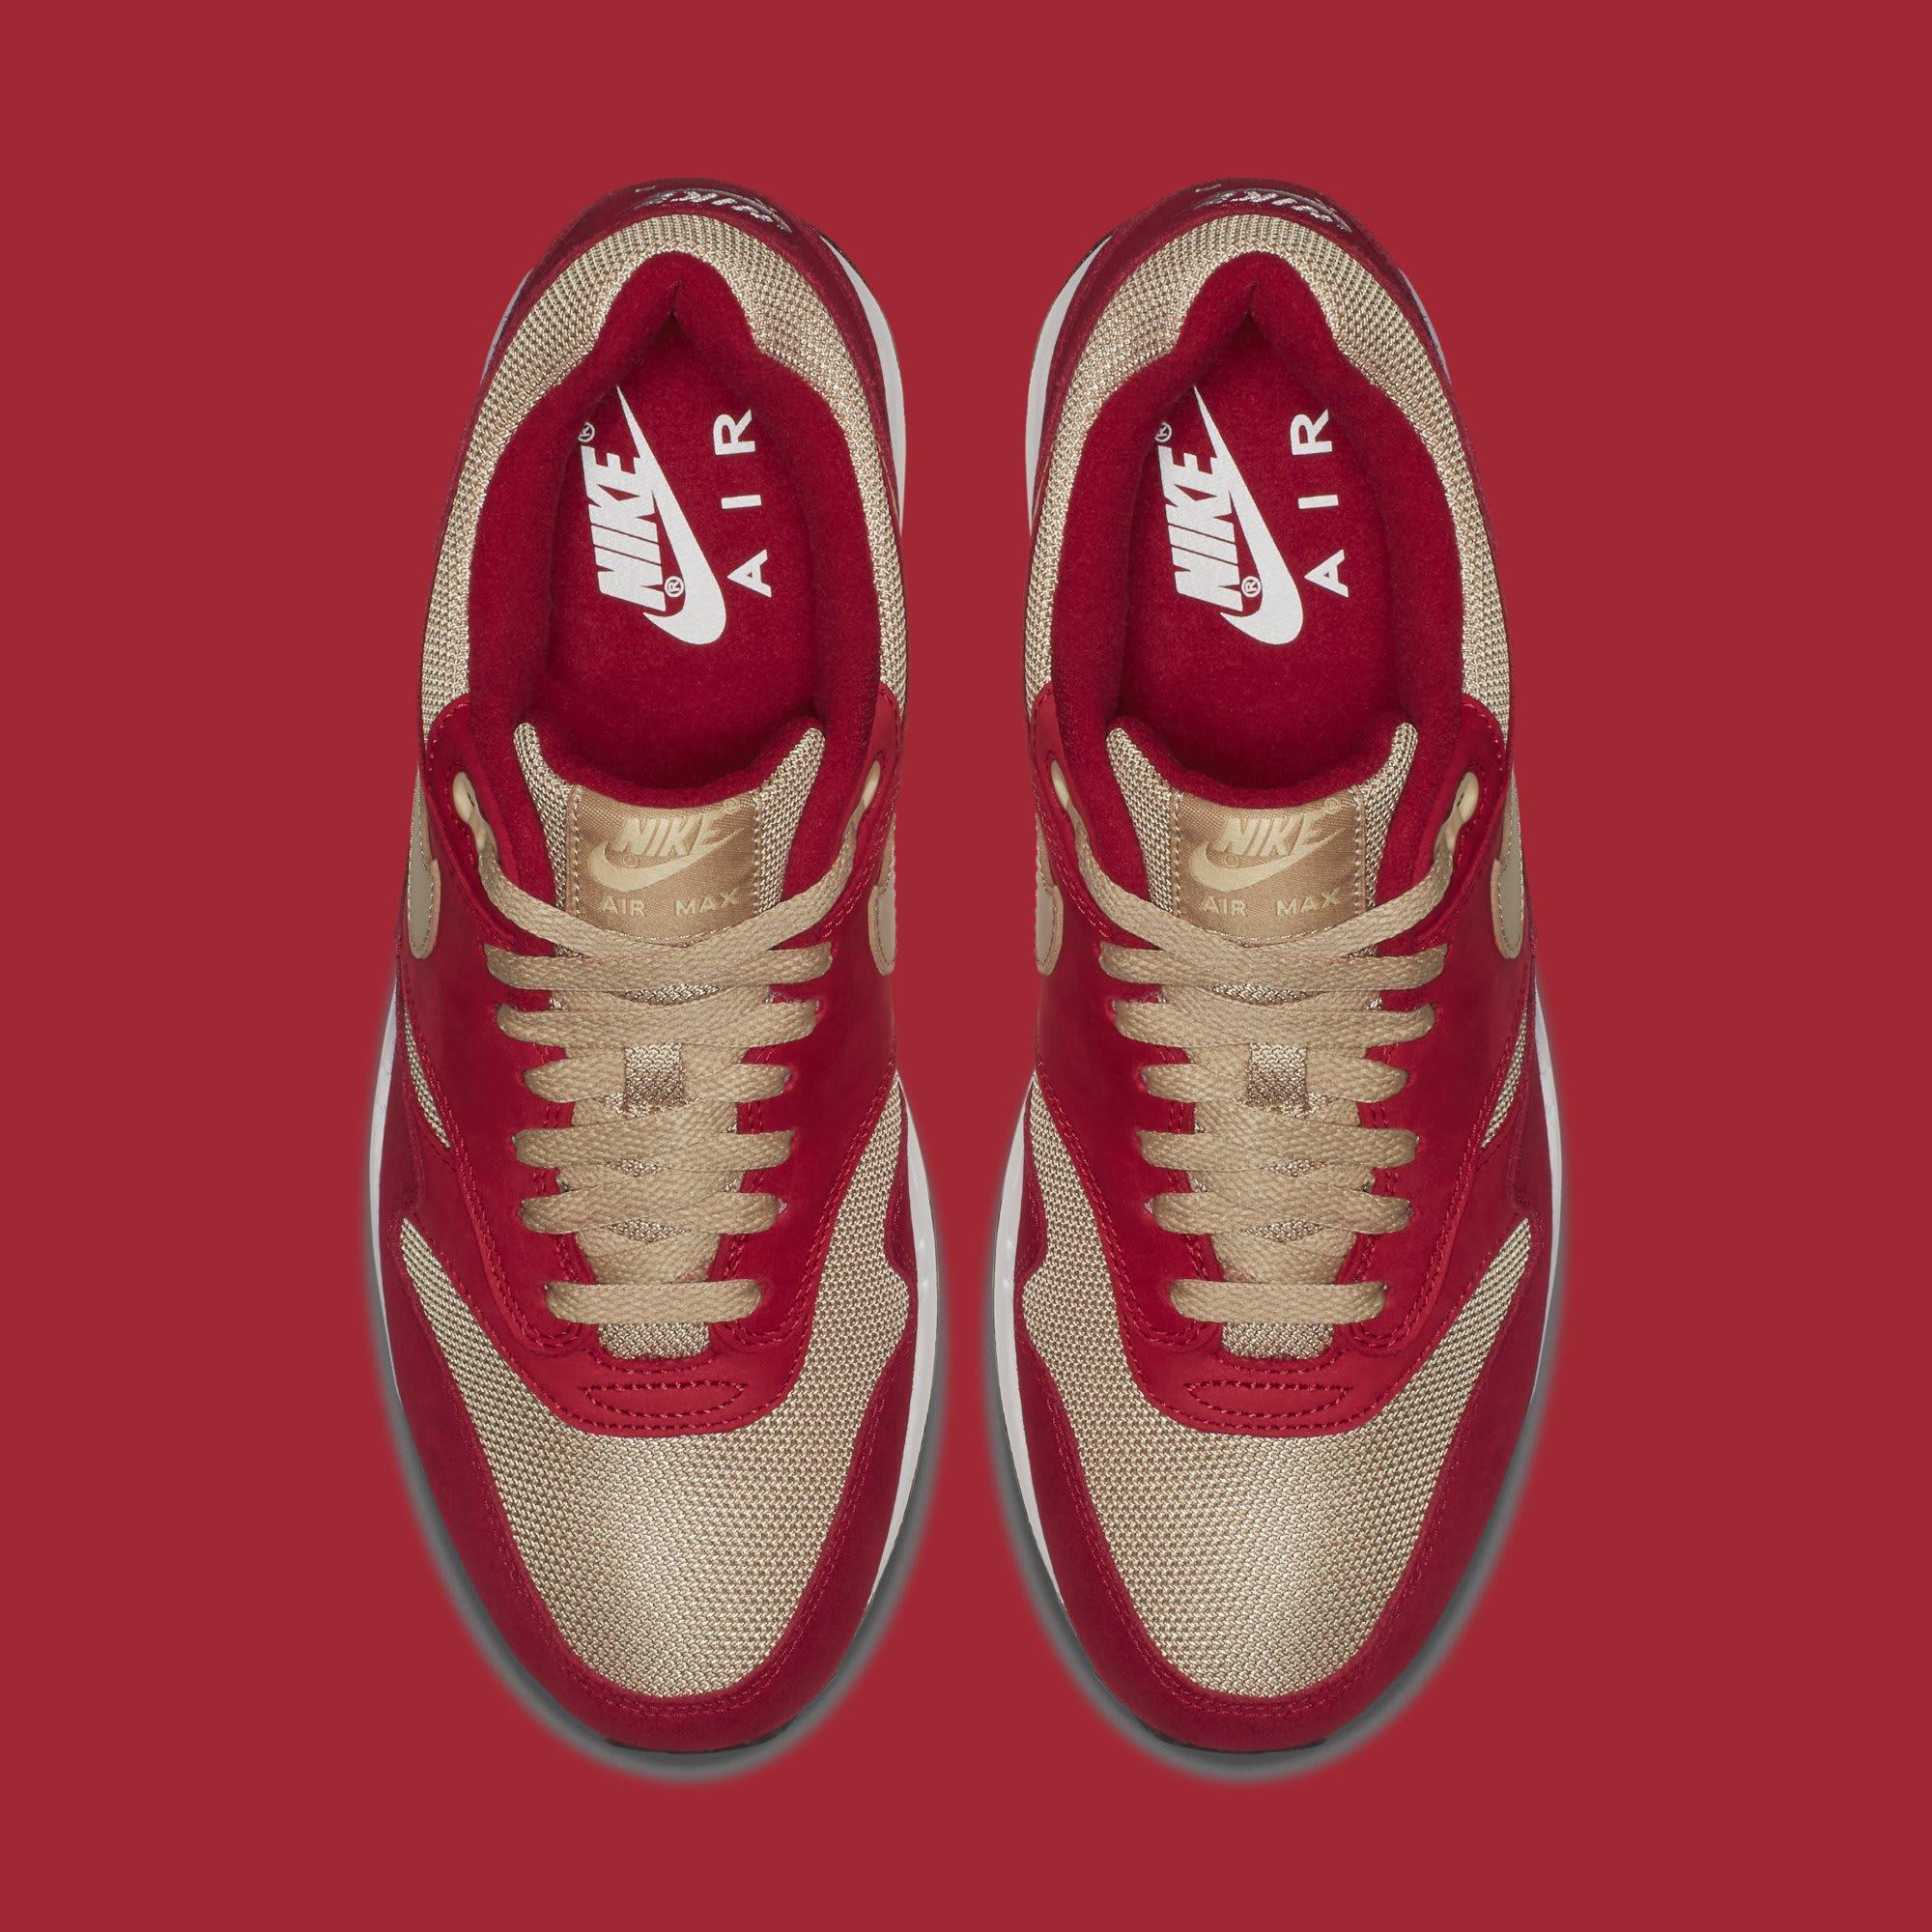 Atmos x Nike Air Max 1 'Red Curry' 908366-600 (Top)